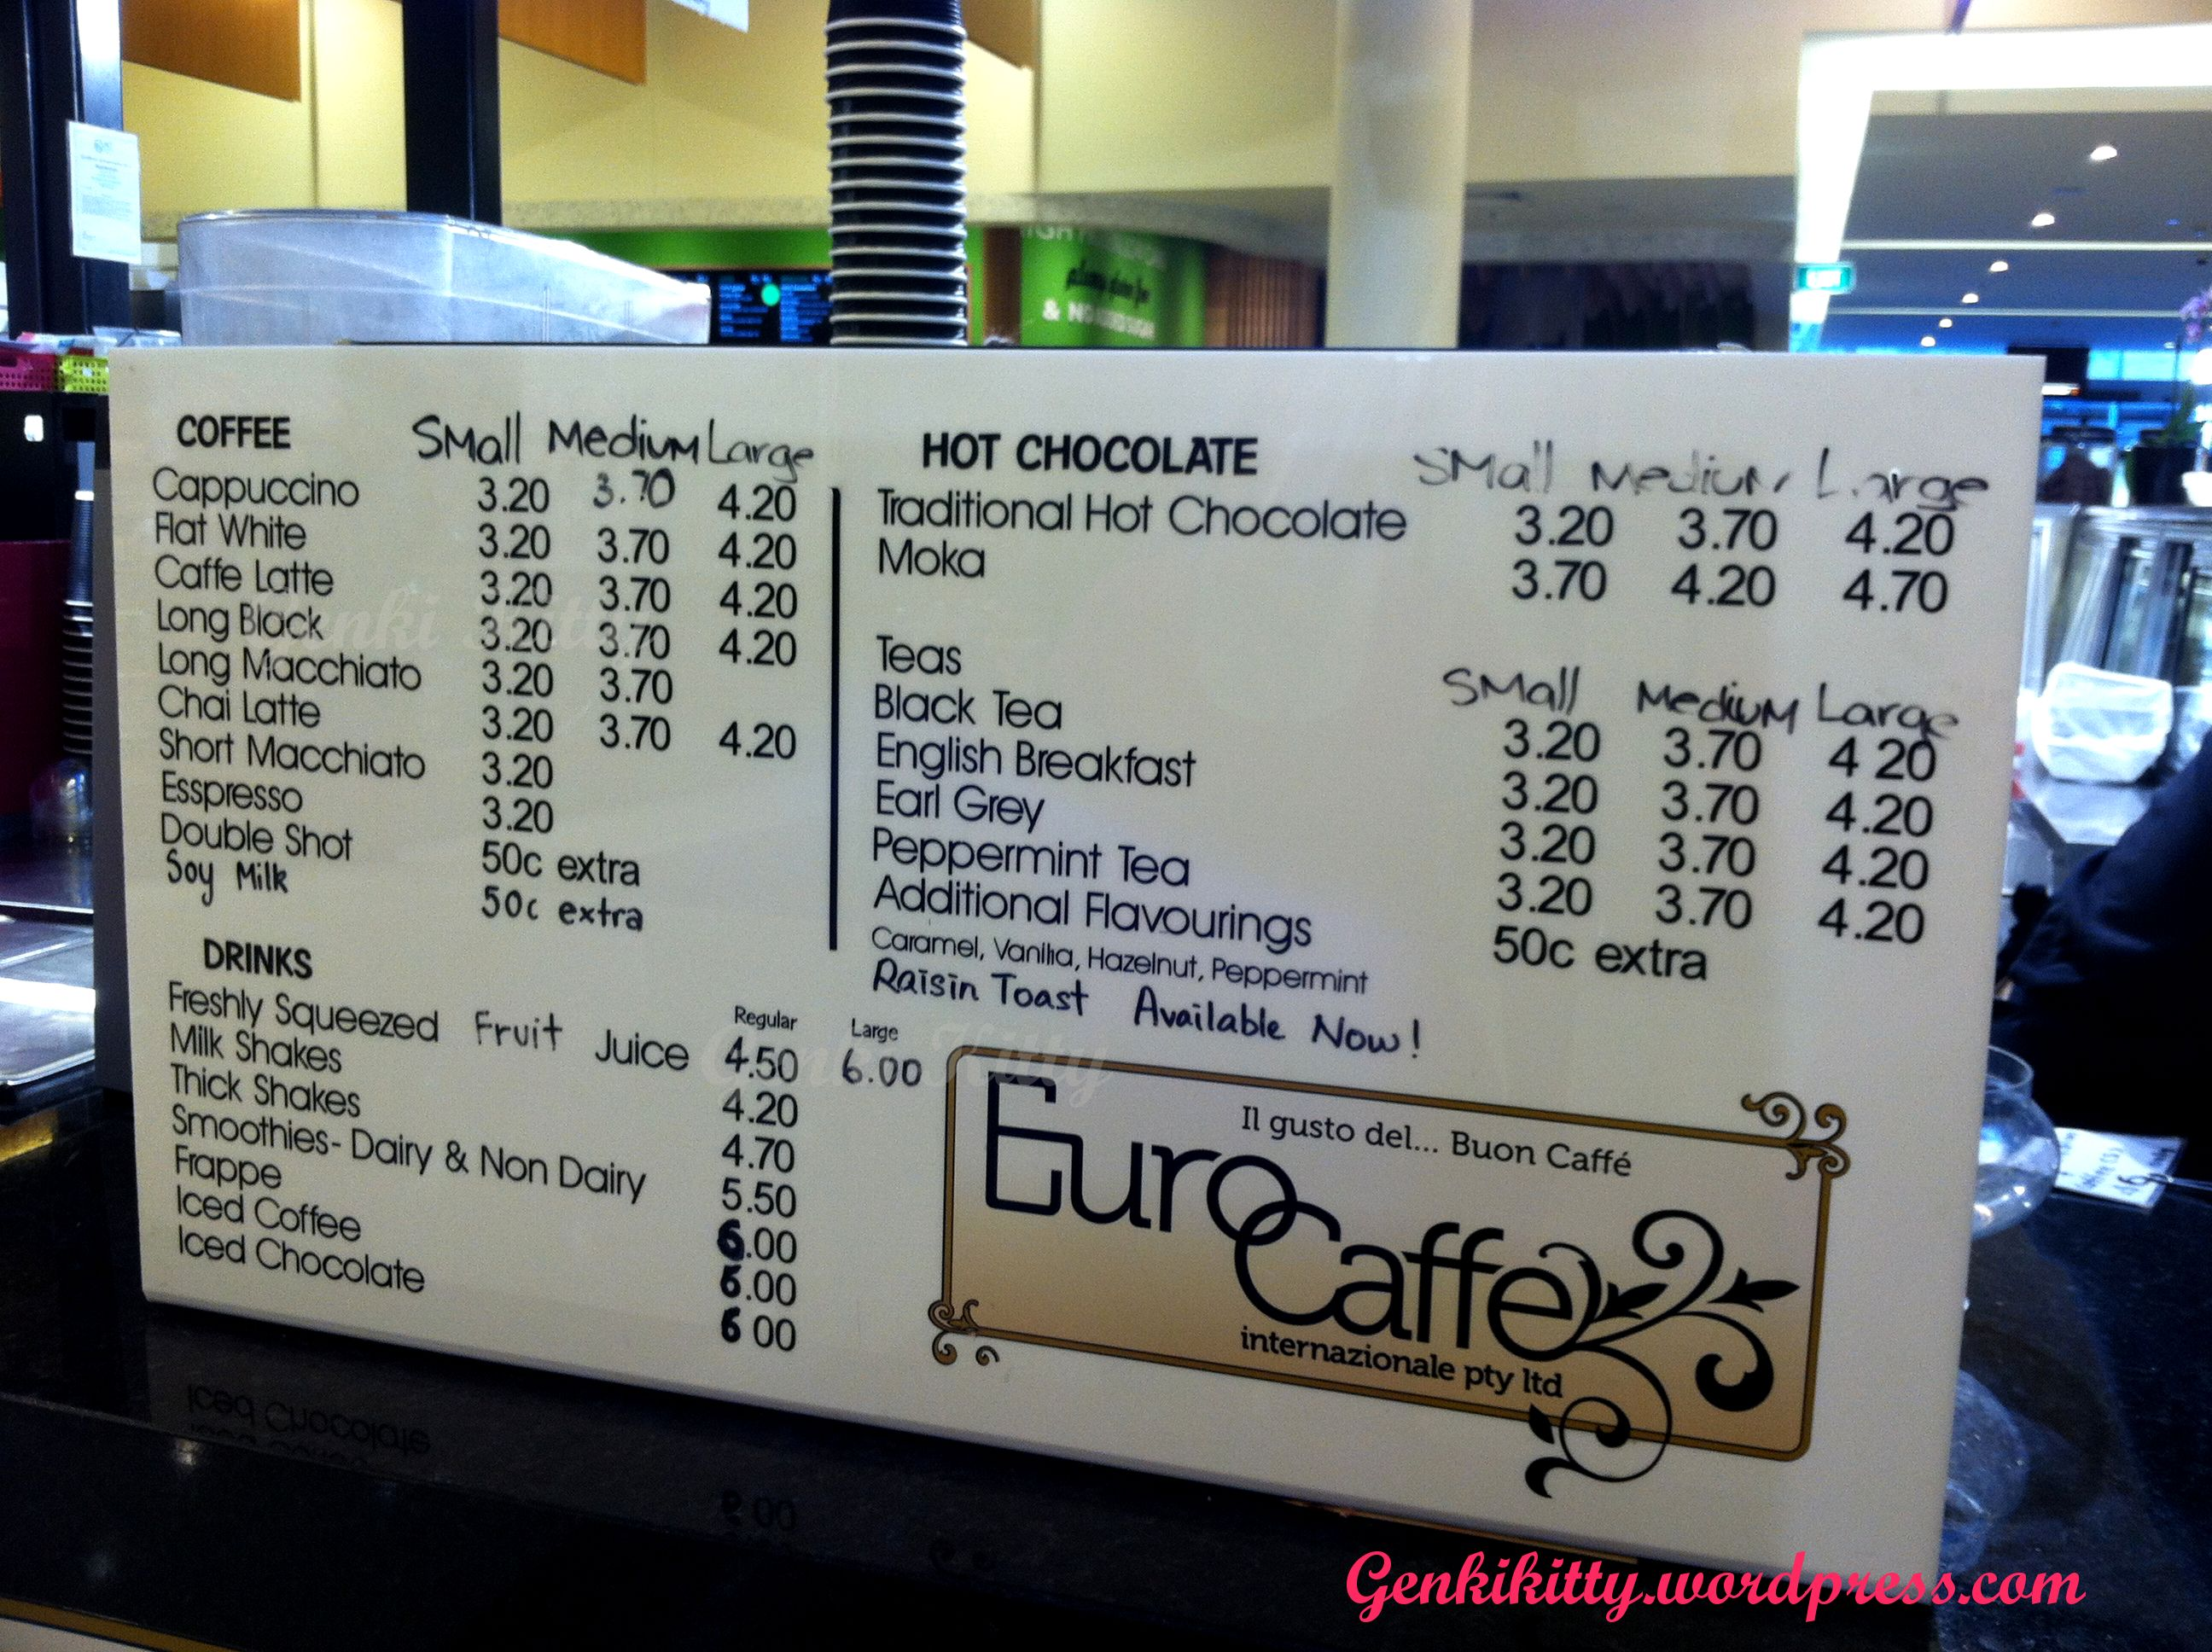 Menu Board from Nutmeg Coffee in Sydney, Australia area.